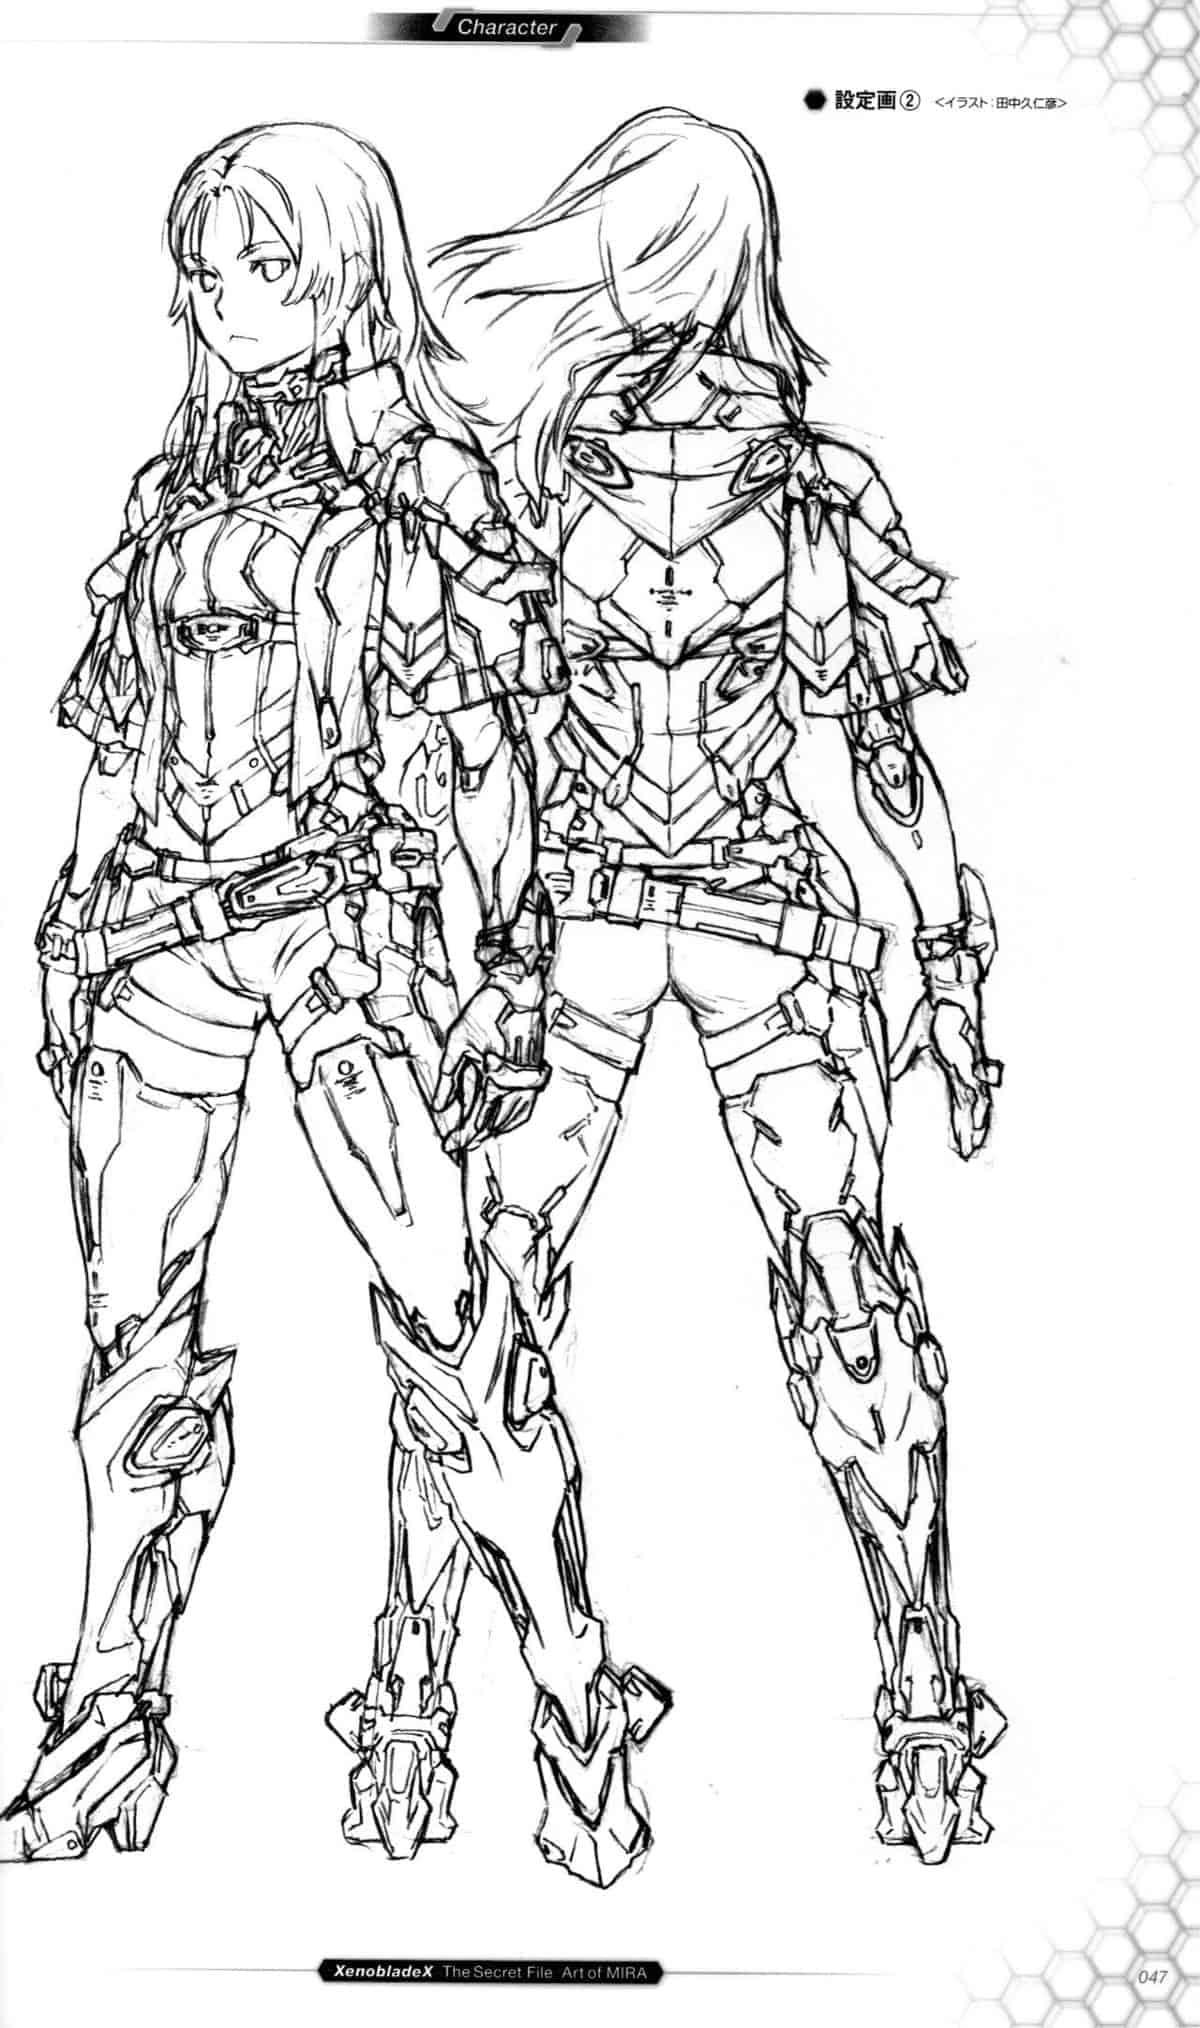 Xenoblade Chronicles X Took A U Turn In Development Story